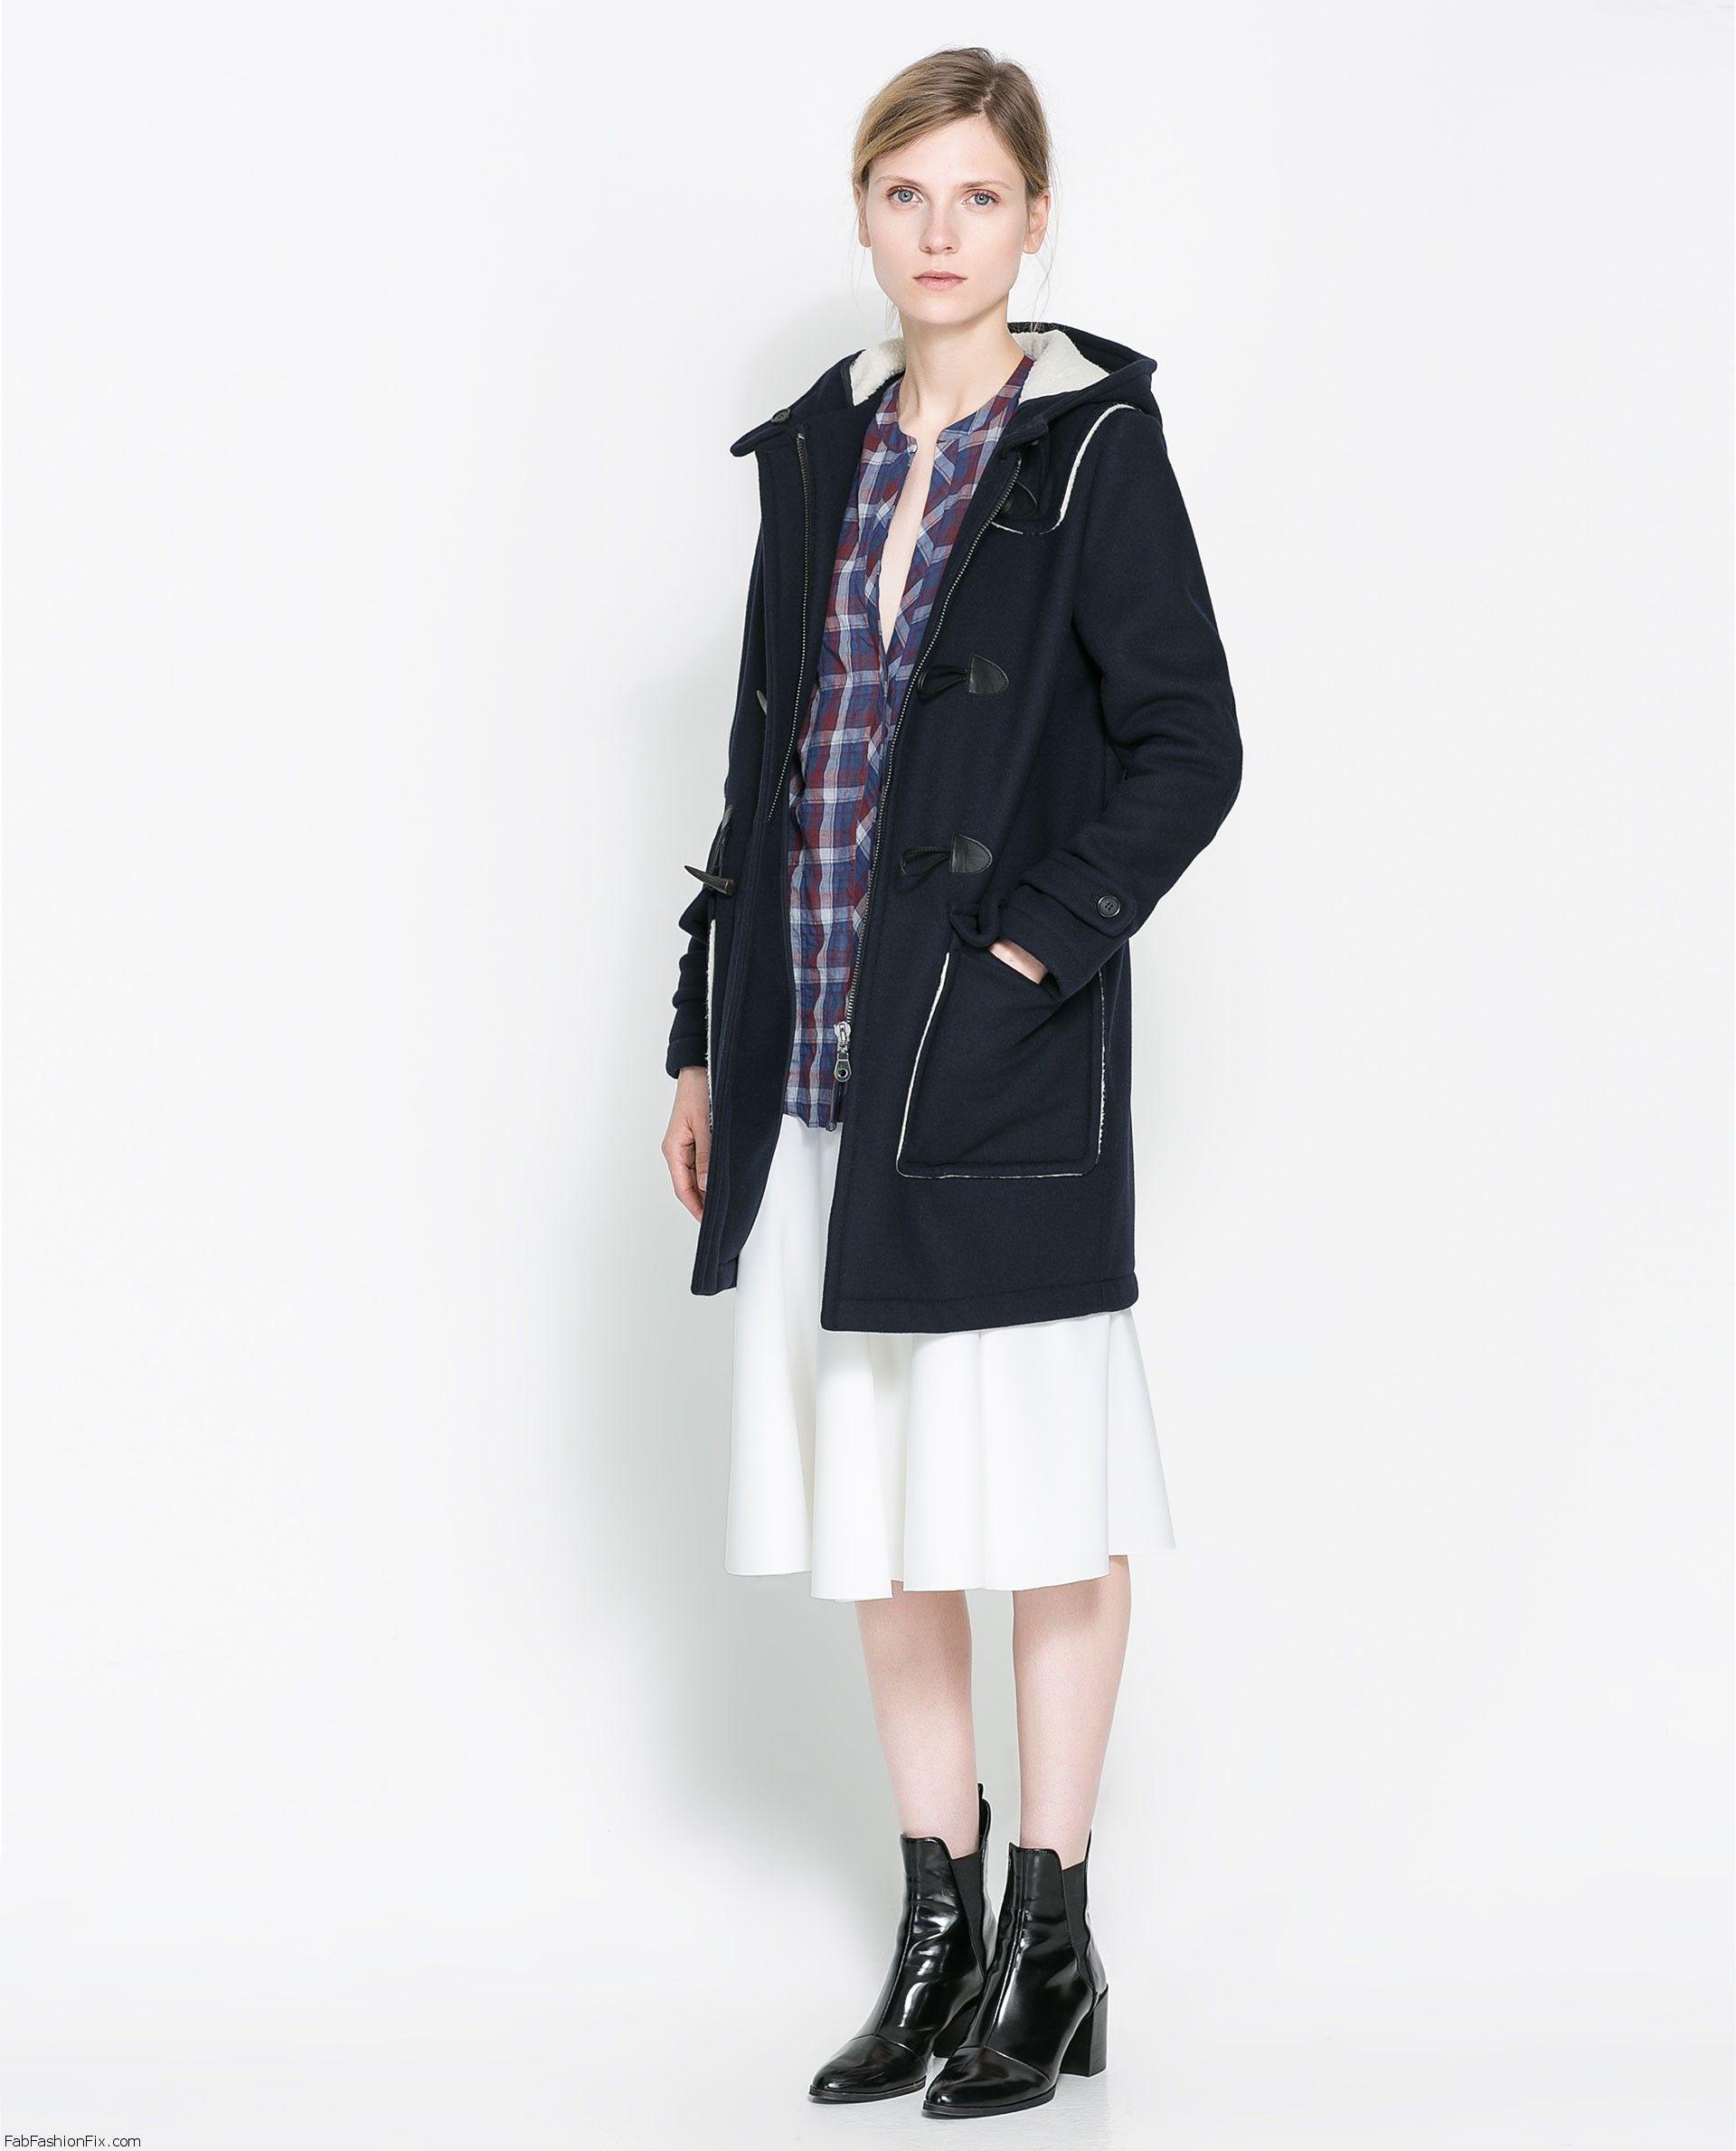 Zara Coats Amp Jackets For Fall Winter 2013 Fab Fashion Fix